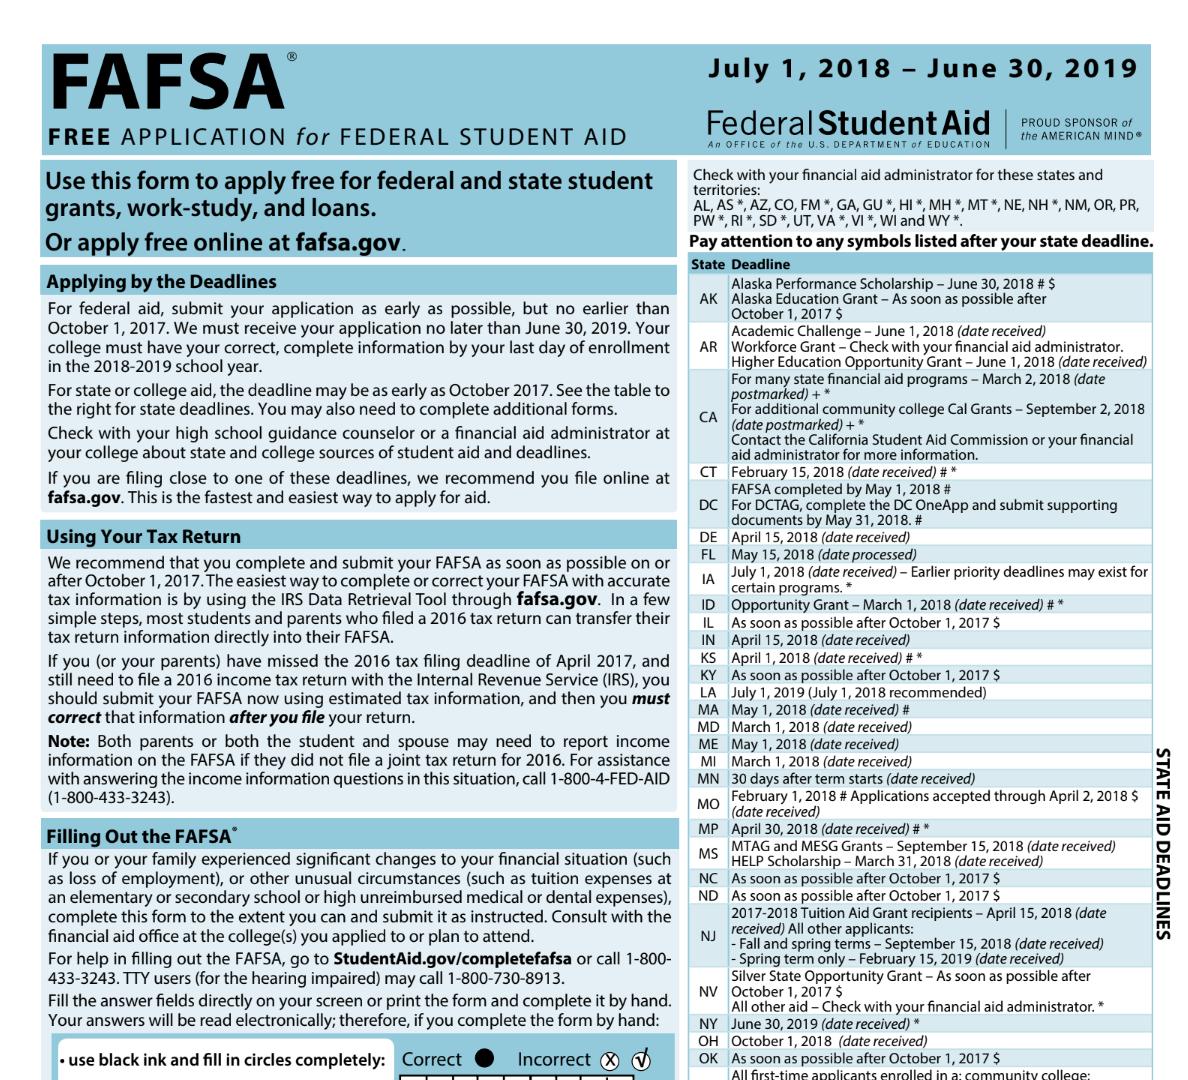 As pdf fafsa